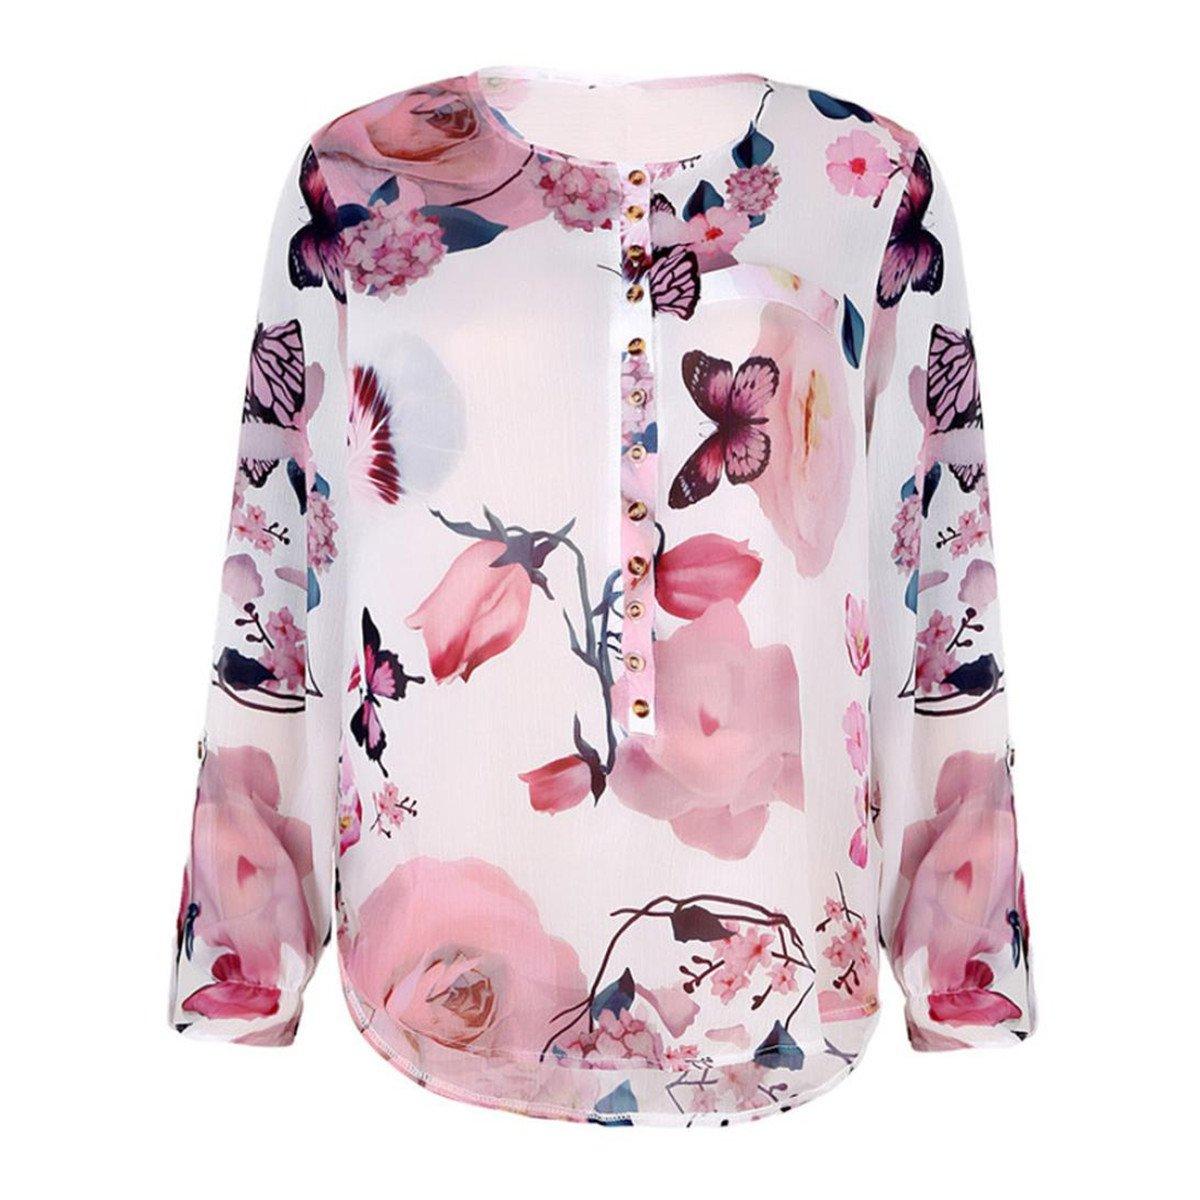 HongXander Plus Size Women Casual Floral Printed Beach Blouse Button T-Shirt Chiffon Irregular Hem Top by HongXander-Shirts (Image #4)